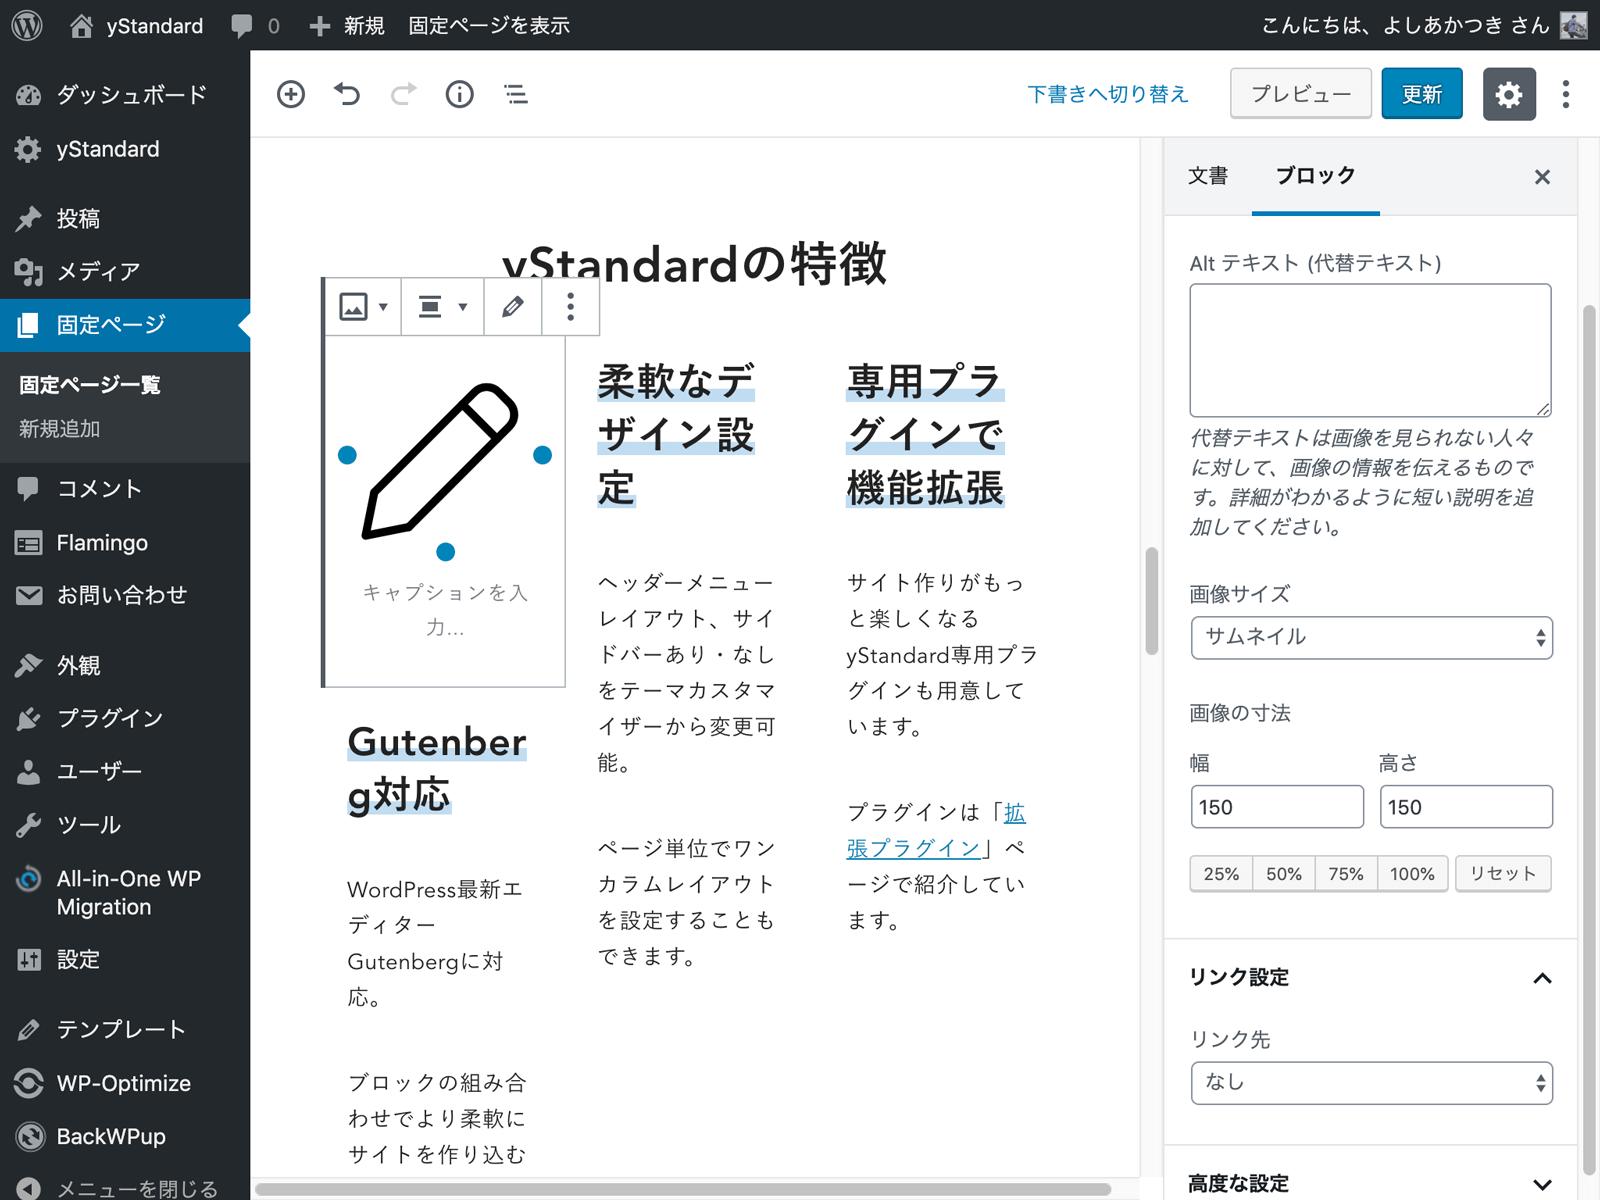 SVGファイルを画像ブロックで追加した状態